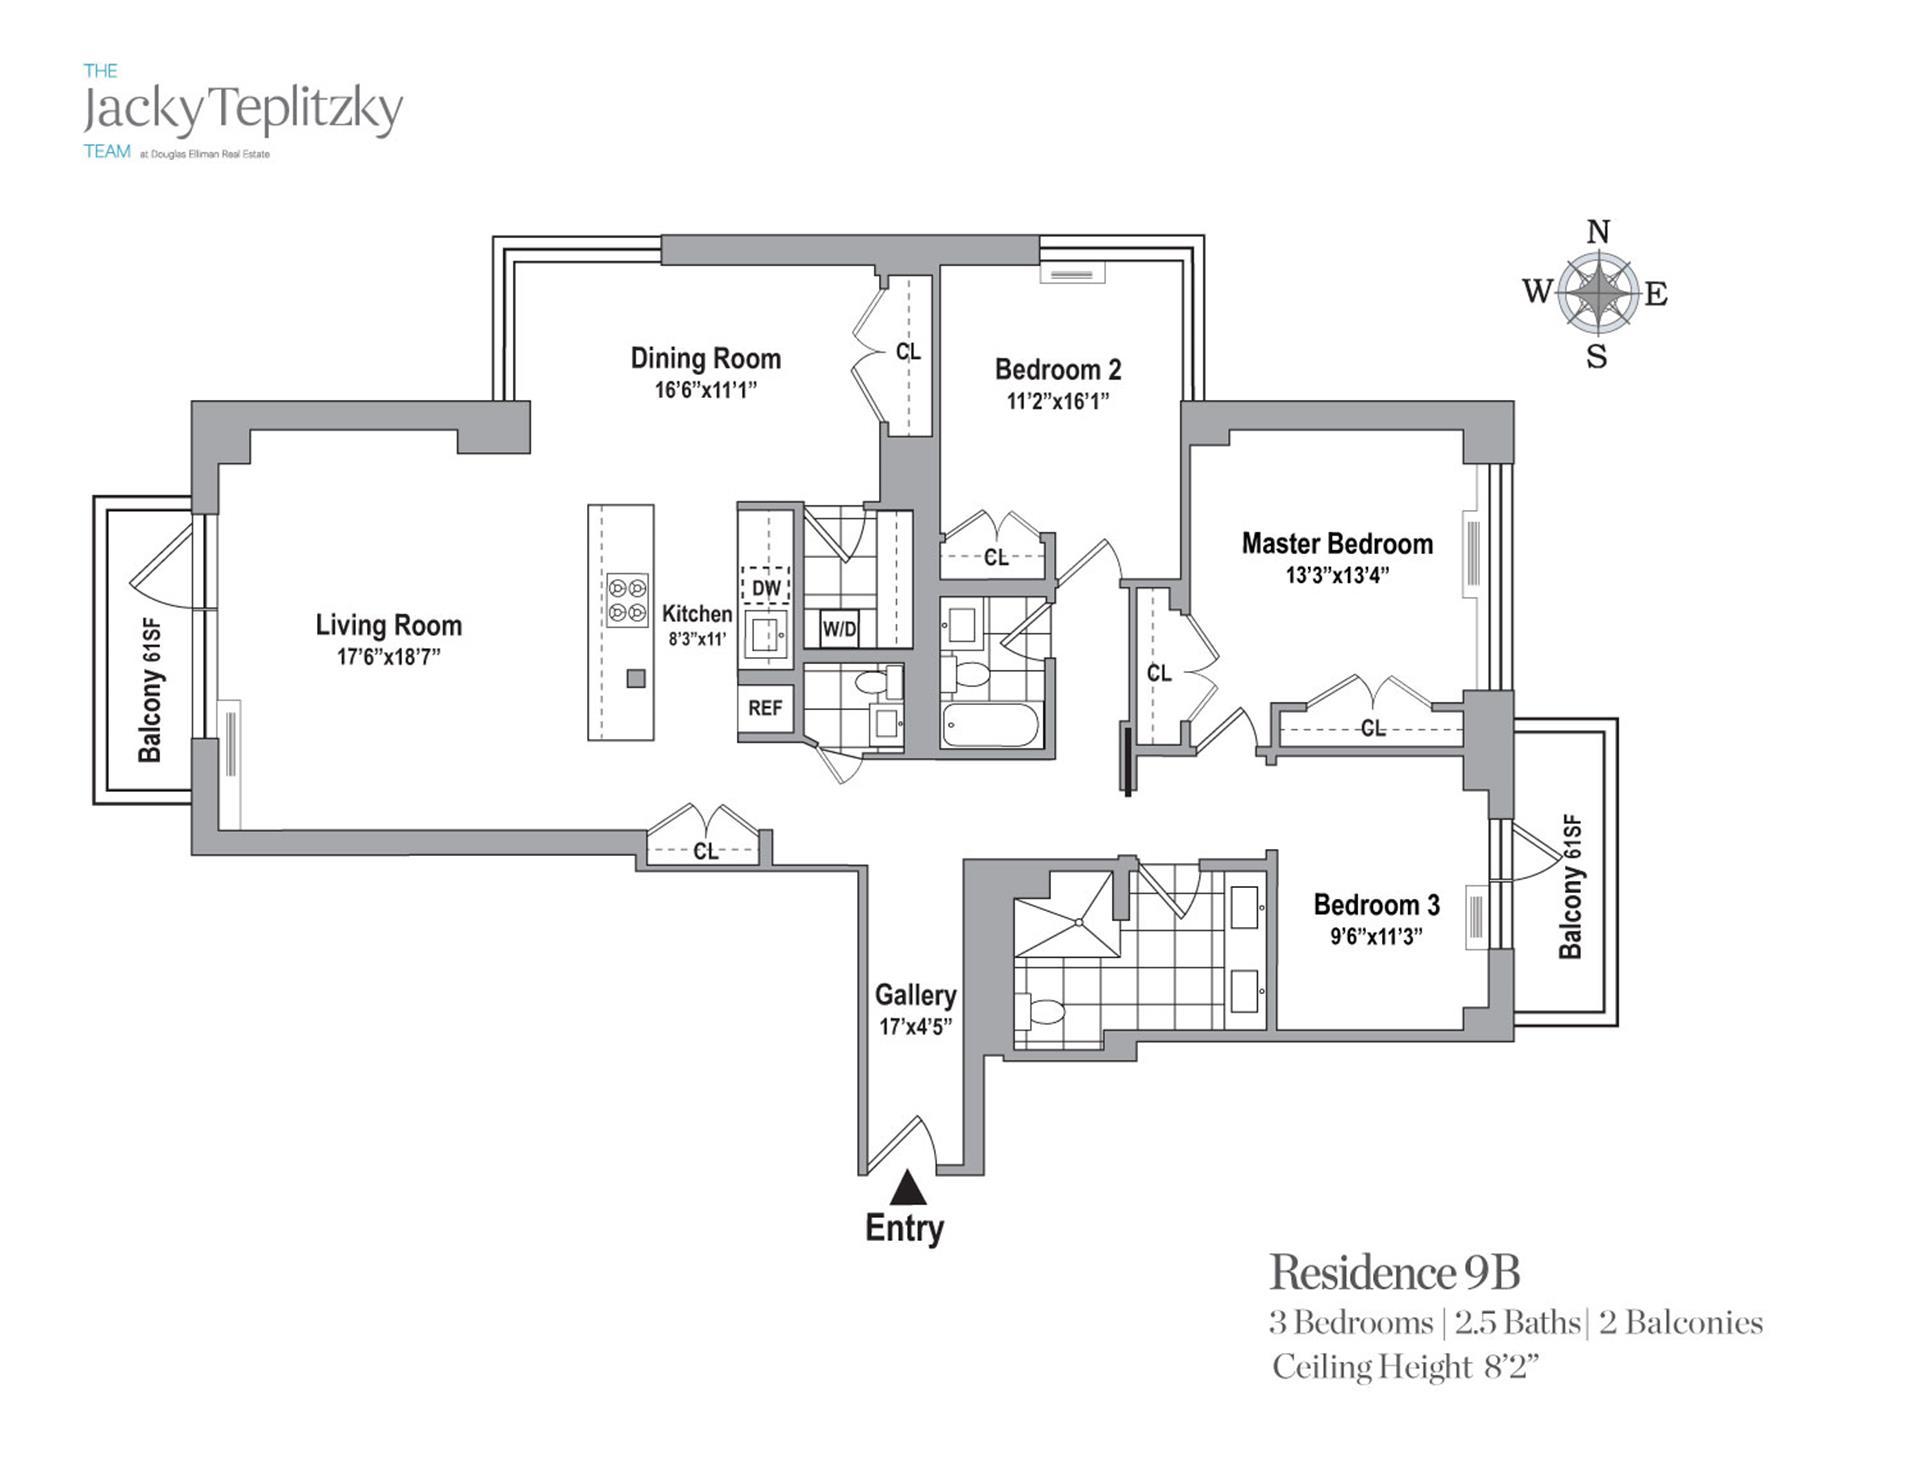 Floor plan of Maison East, 1438 Third Avenue, 9B - Upper East Side, New York